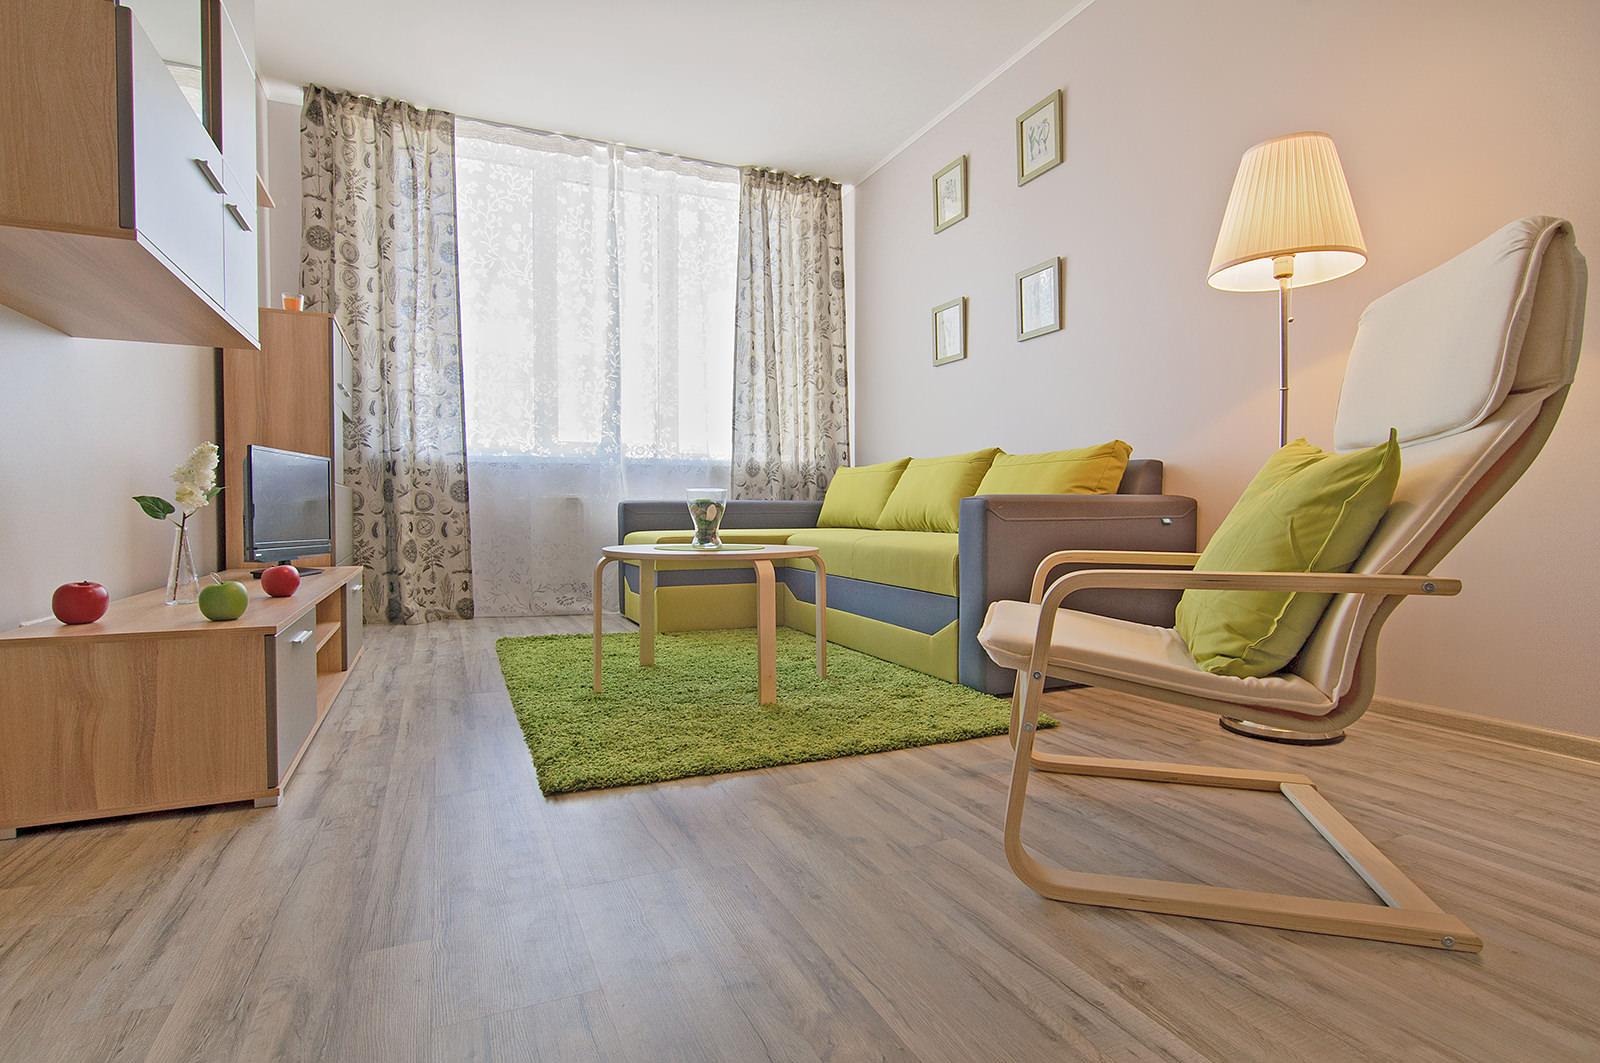 ednostaen-apartament-s-moderen-i-uiuten-interior-42-m-1g